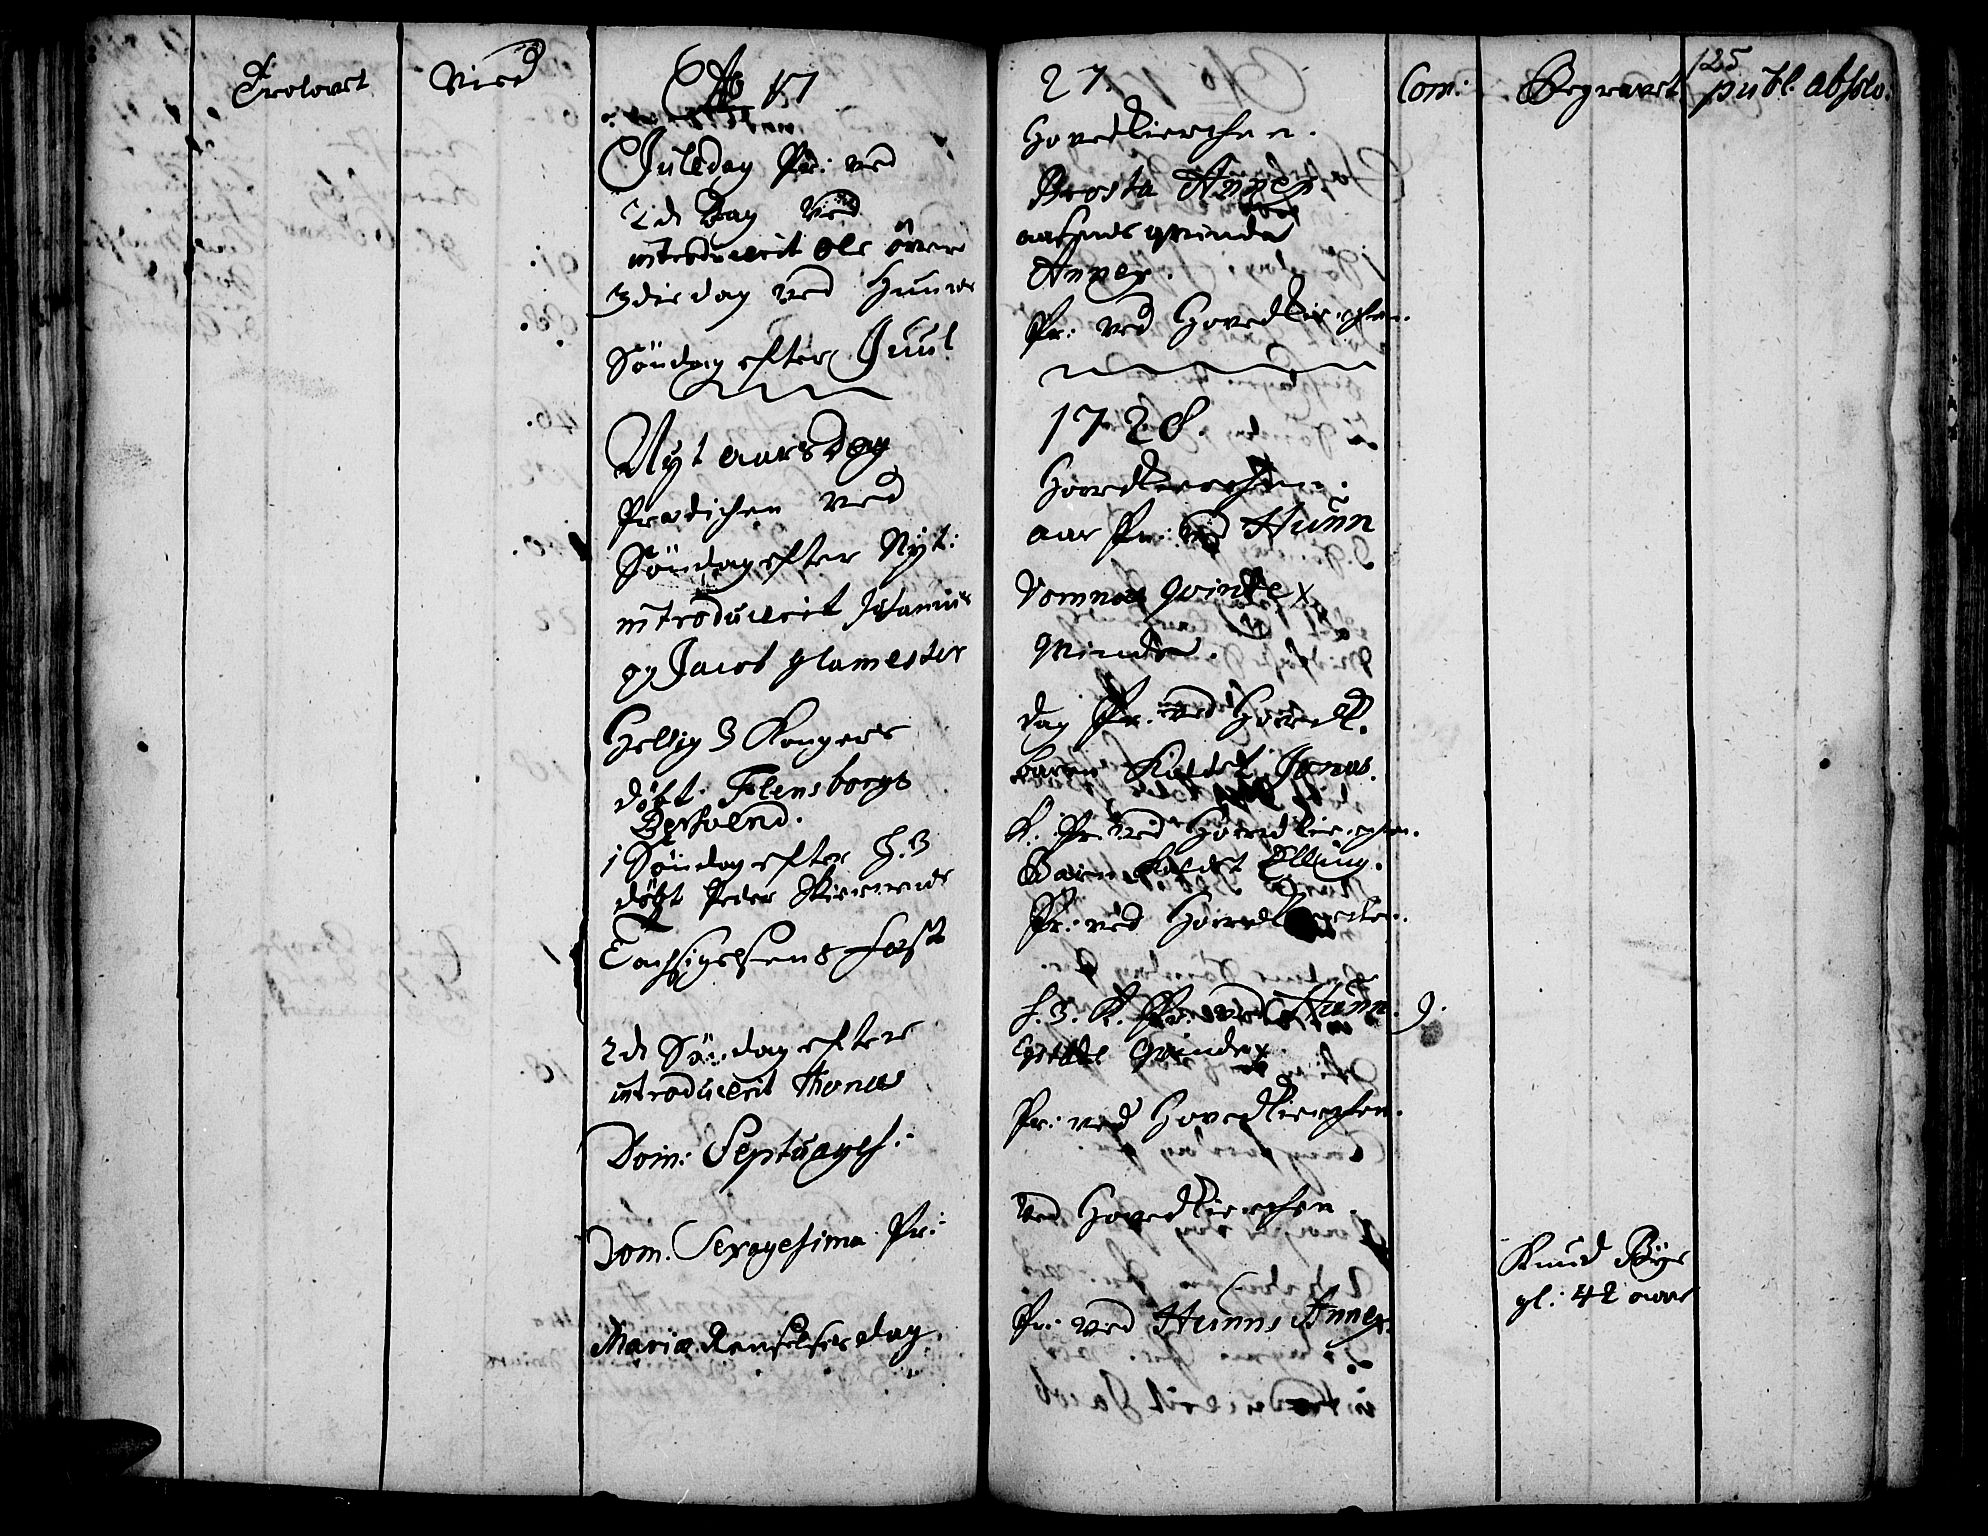 SAH, Vardal prestekontor, H/Ha/Haa/L0001: Ministerialbok nr. 1, 1706-1748, s. 125